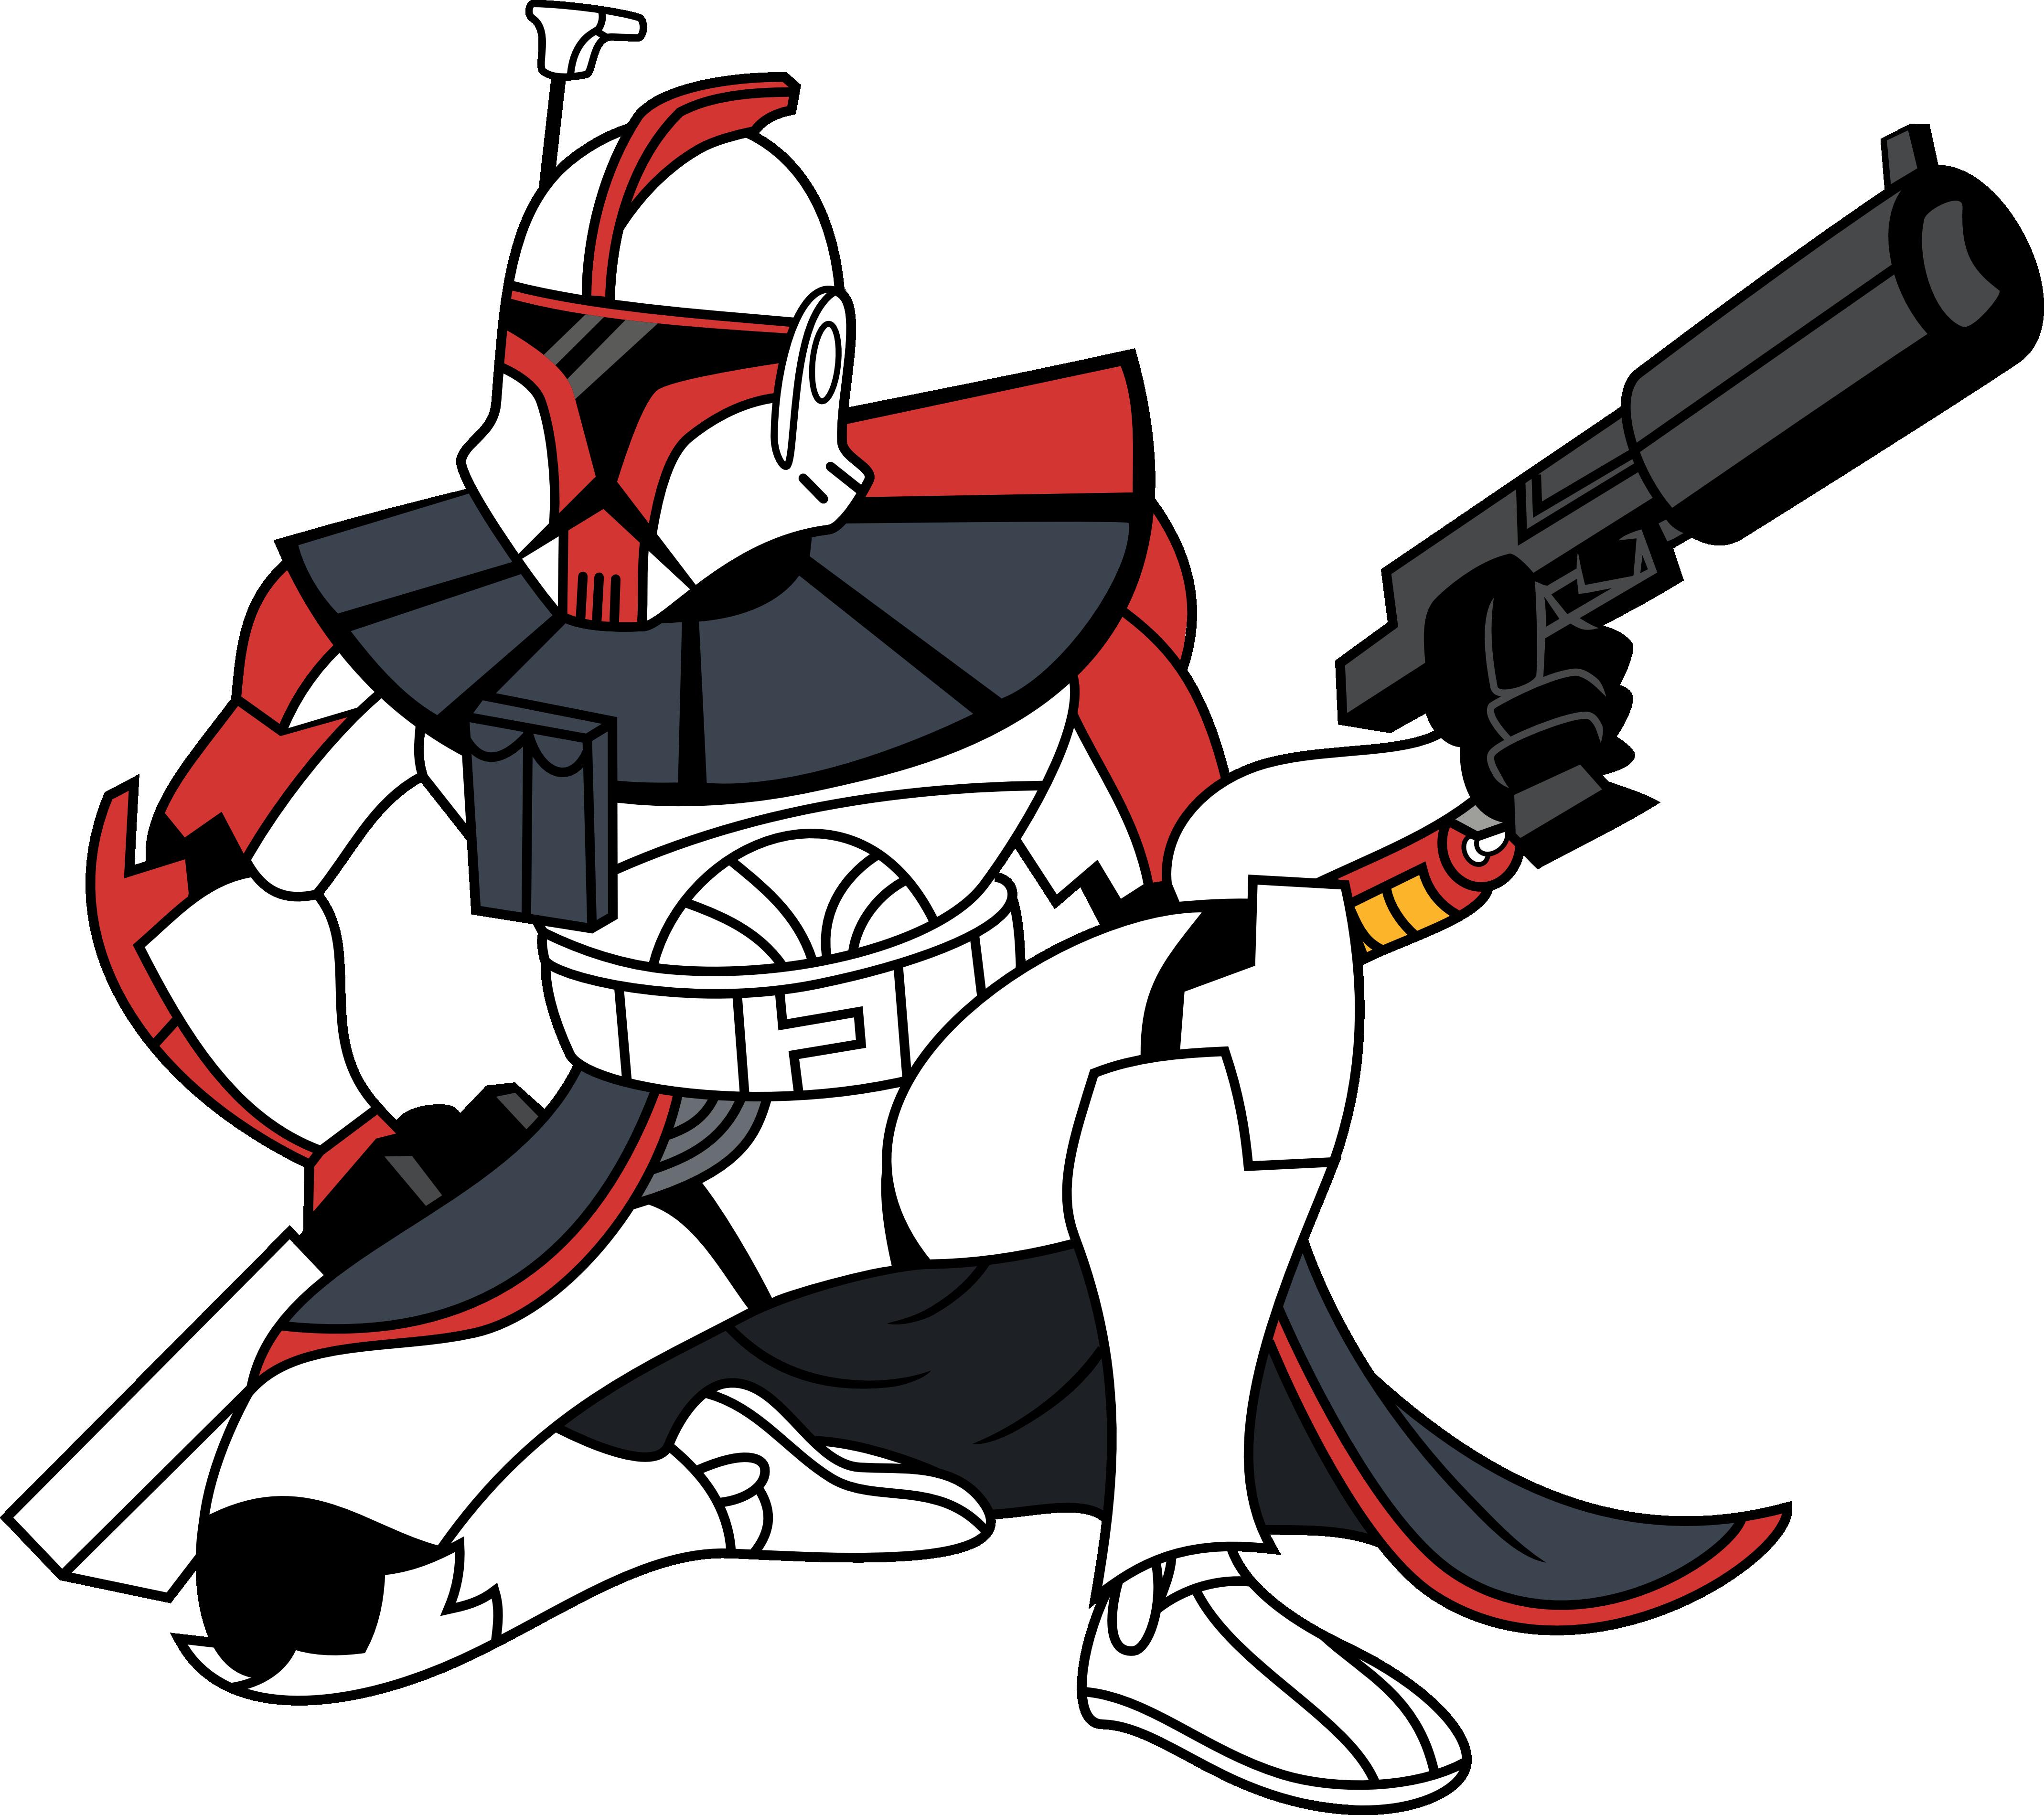 Star wars battlefront clipart svg royalty free Clone trooper Star Wars Battlefront II ARC Troopers 501st Legion ... svg royalty free